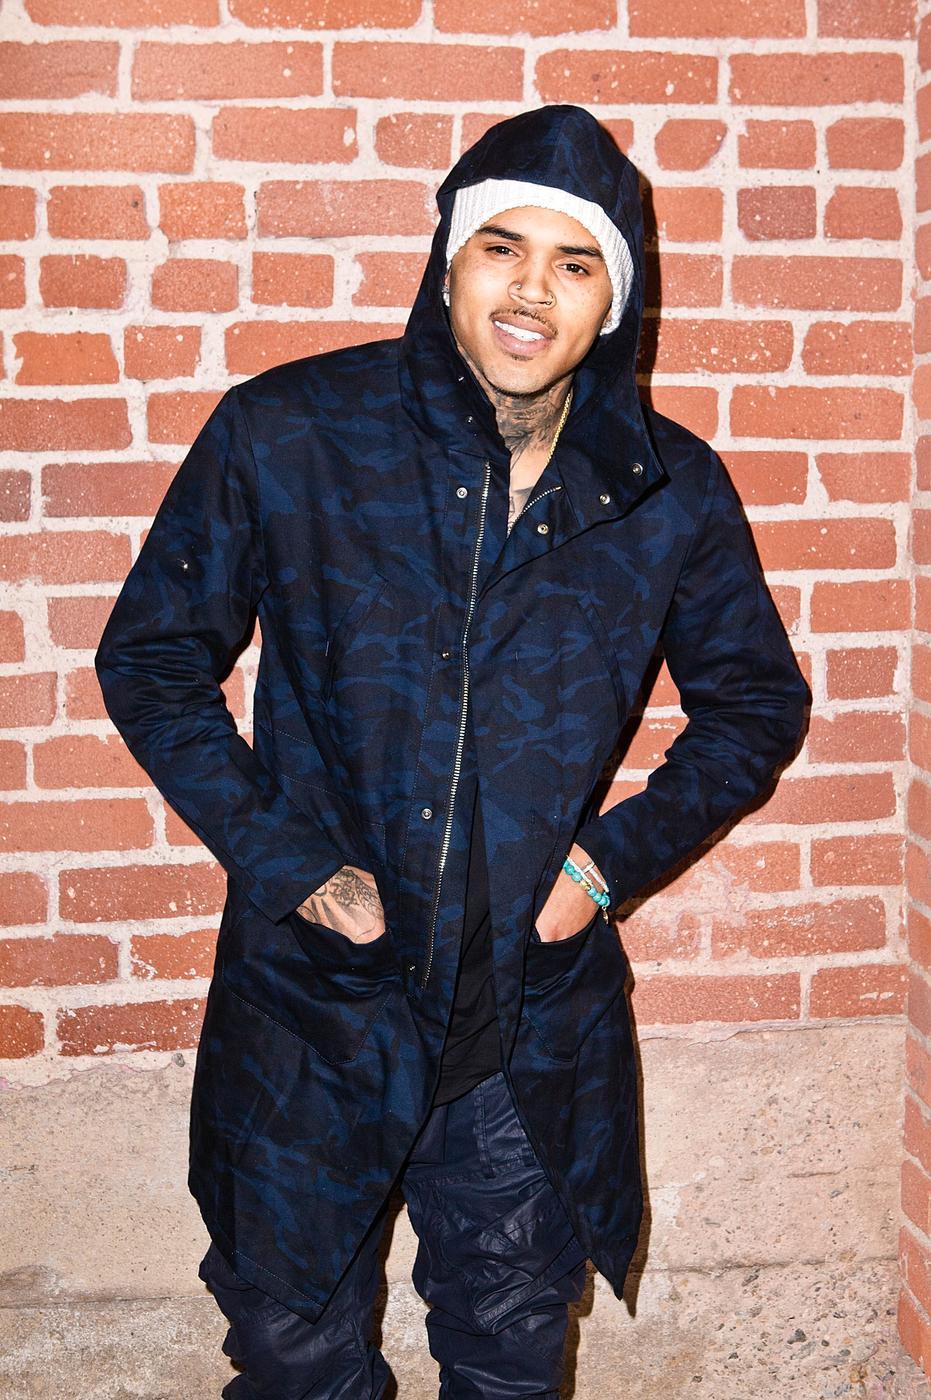 Chris Brown is trying to win back ex-girlfriend Karrueche Tran